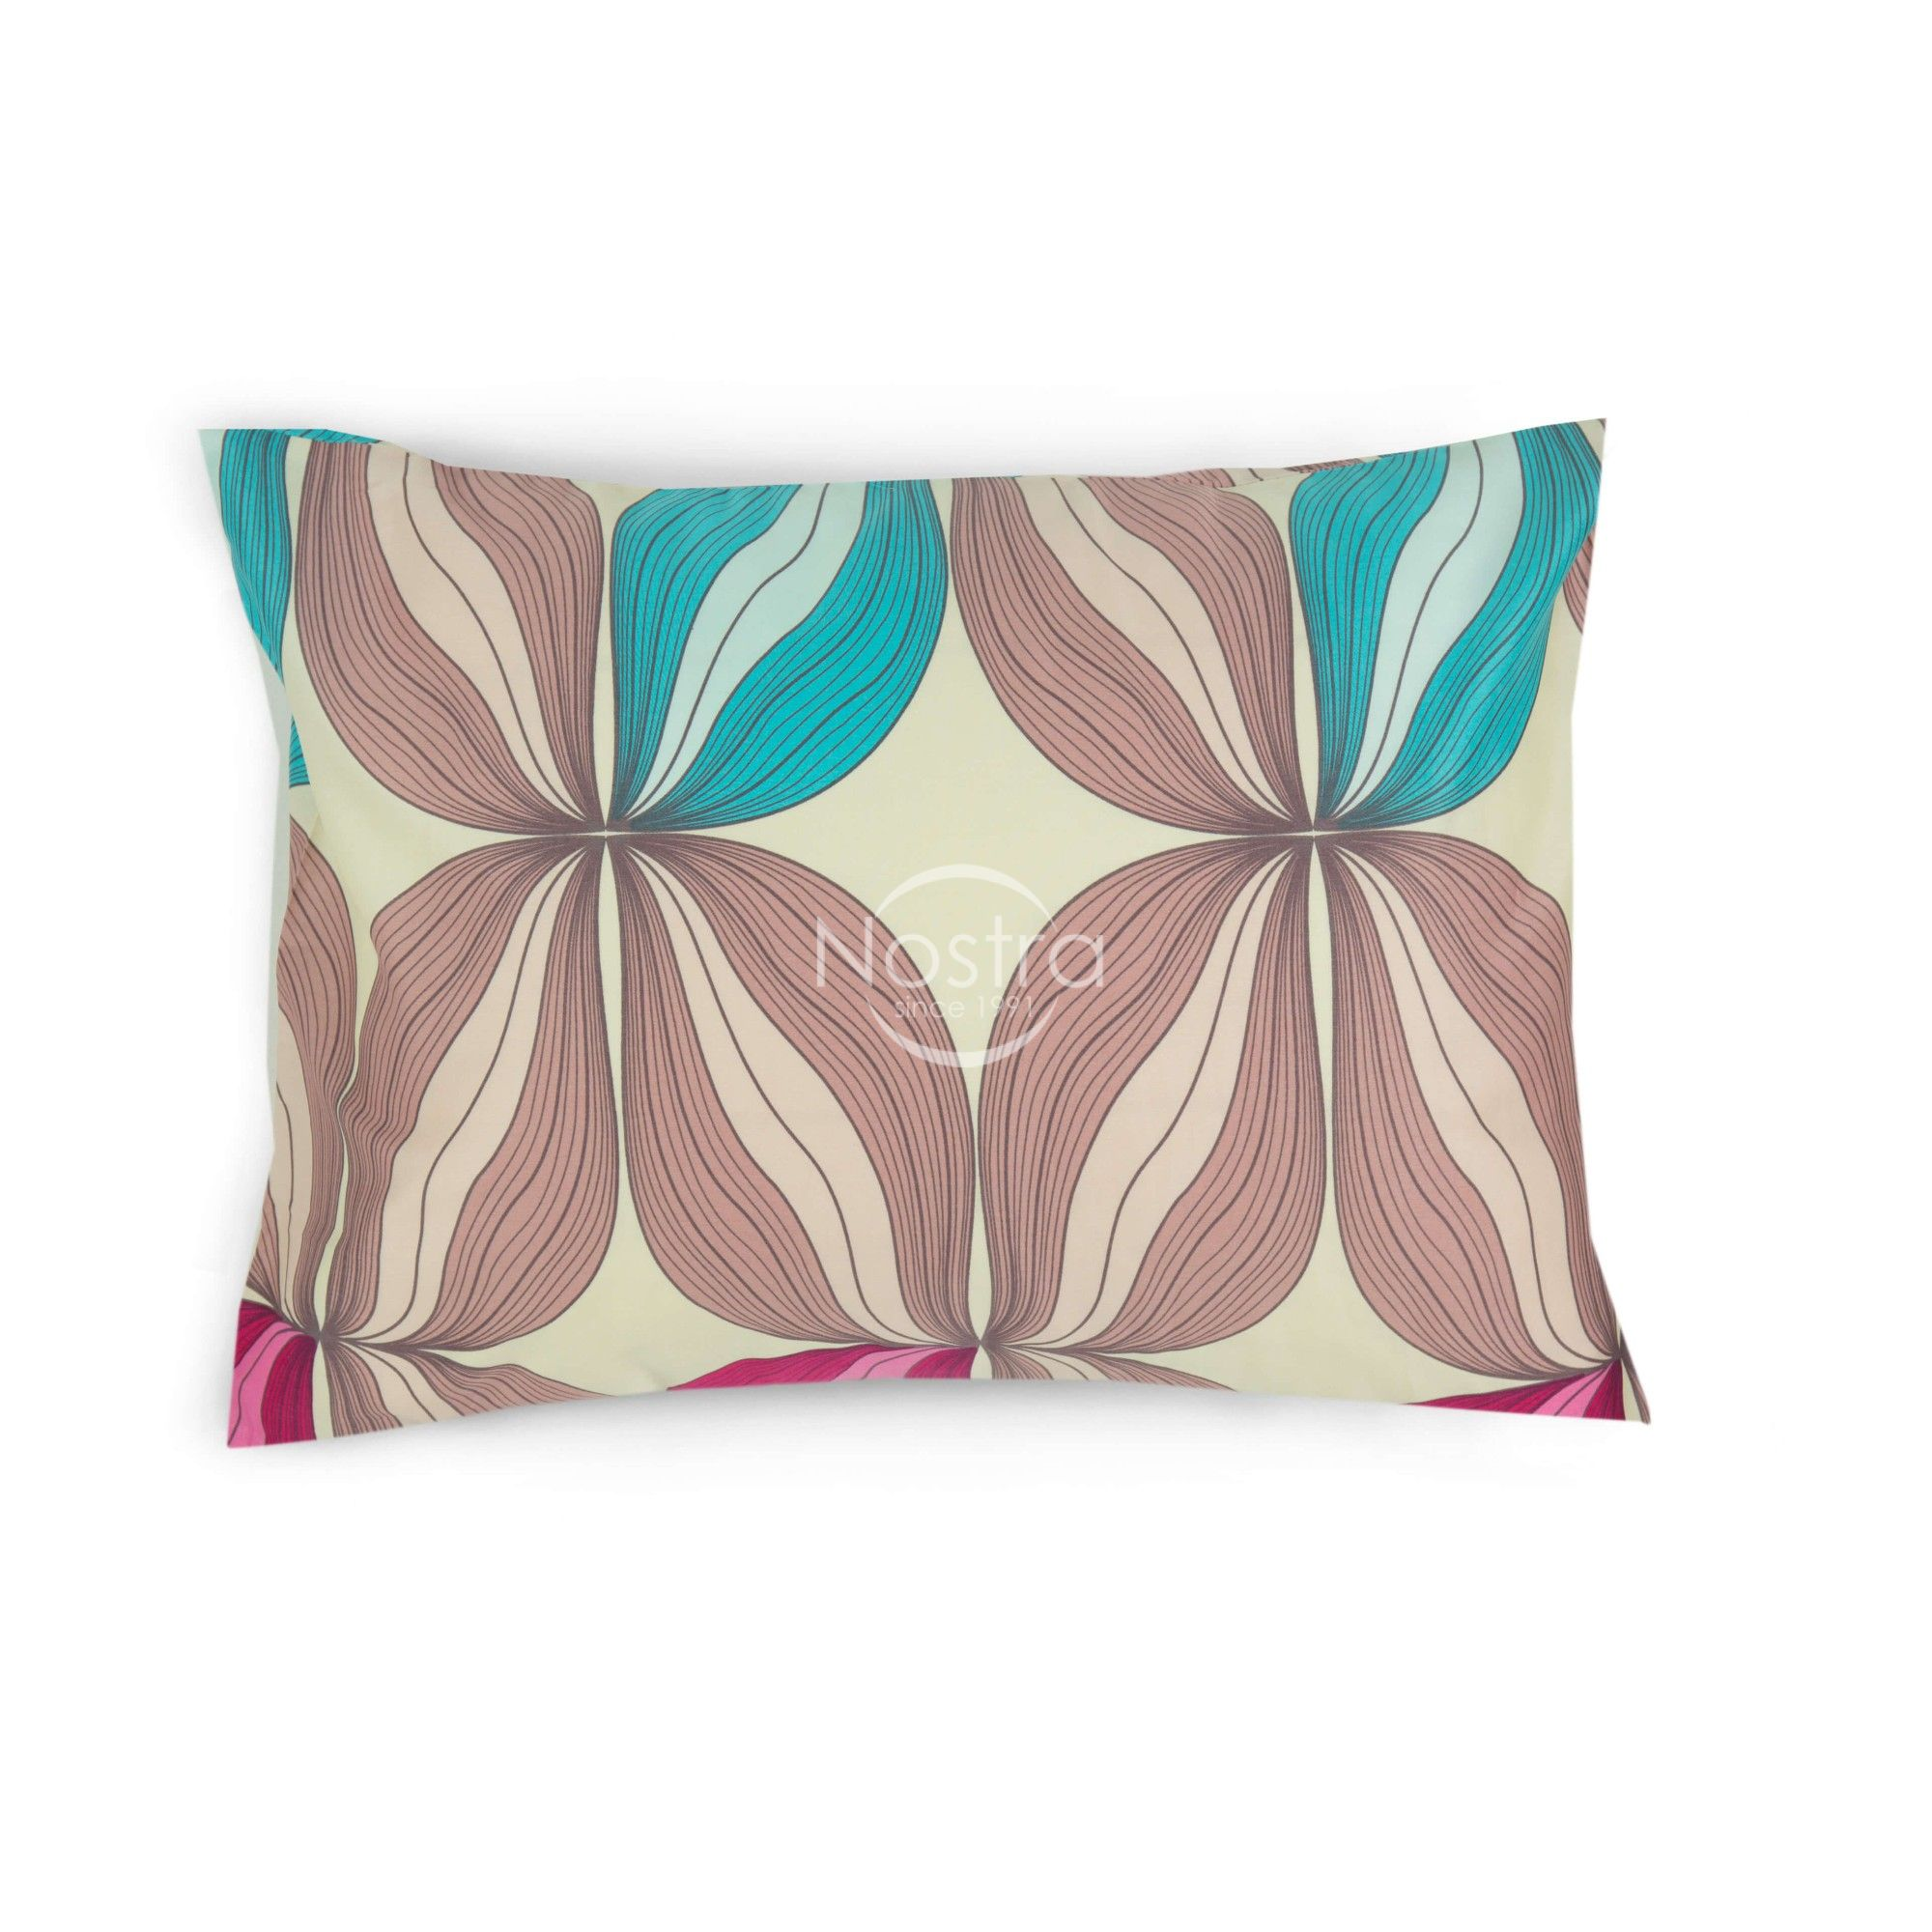 Satino pagalvės užvalkalas 40-0737-BEIGE 50x70 cm